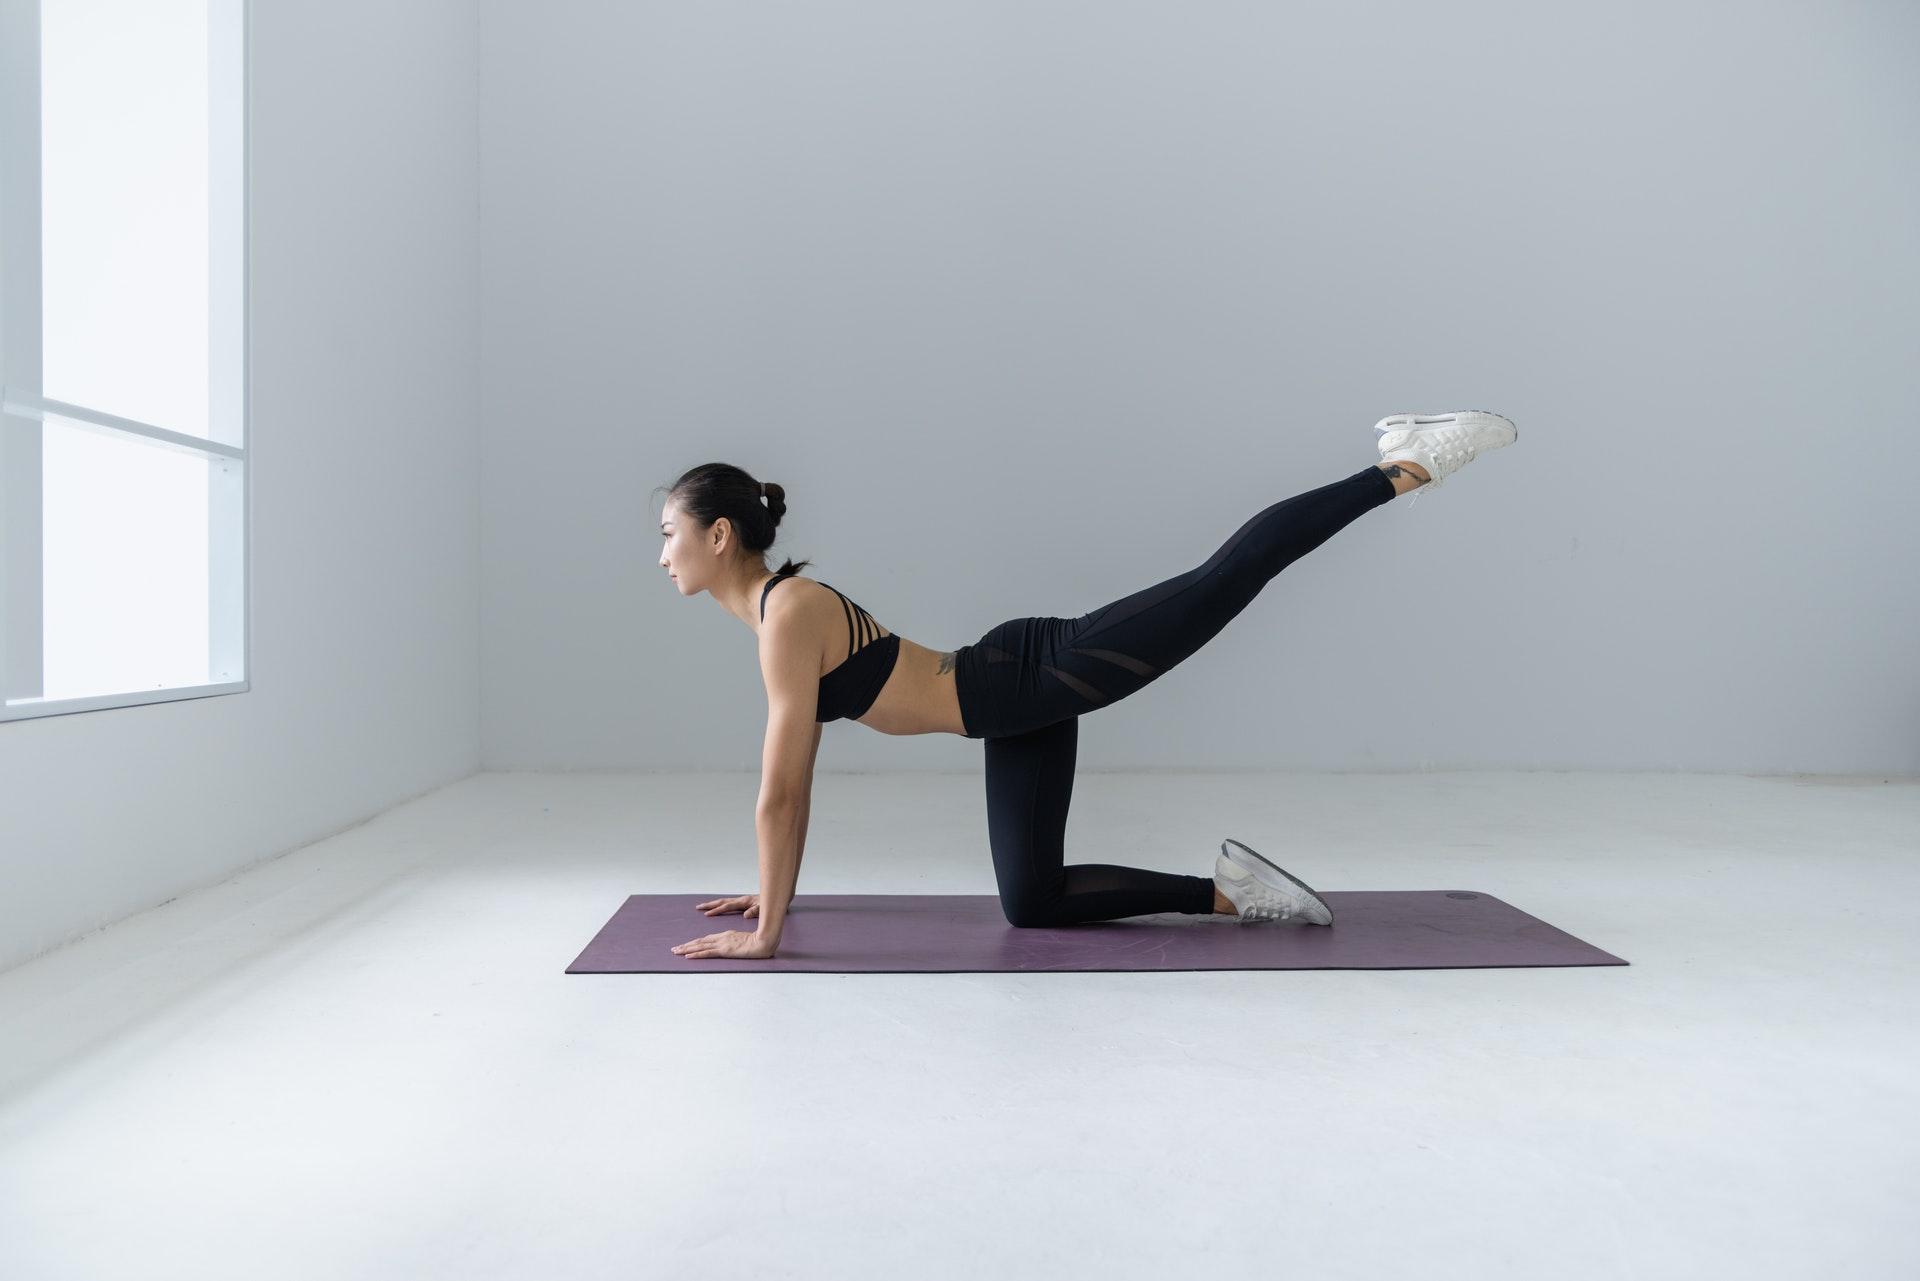 Best yoga asanas to get toned legs